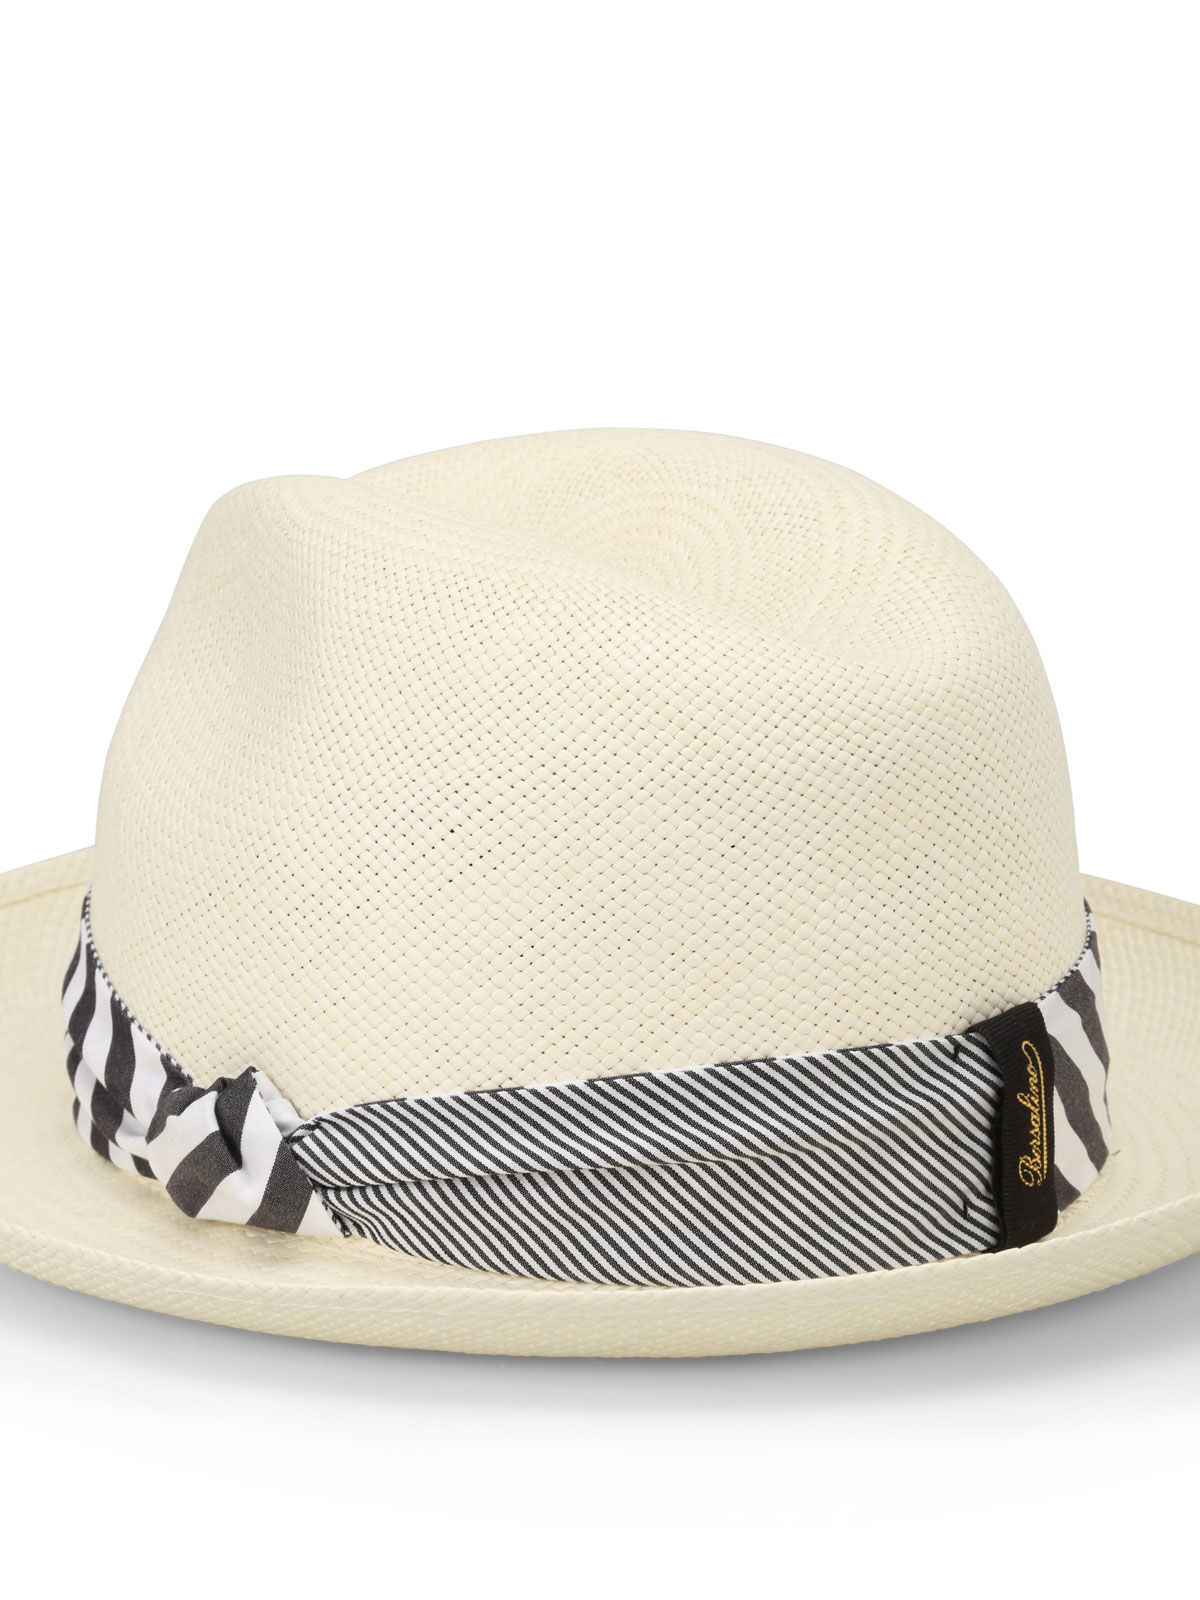 Borsalino - Quito Tie panama straw hat - hats   caps - 1411217580 42190acc6921